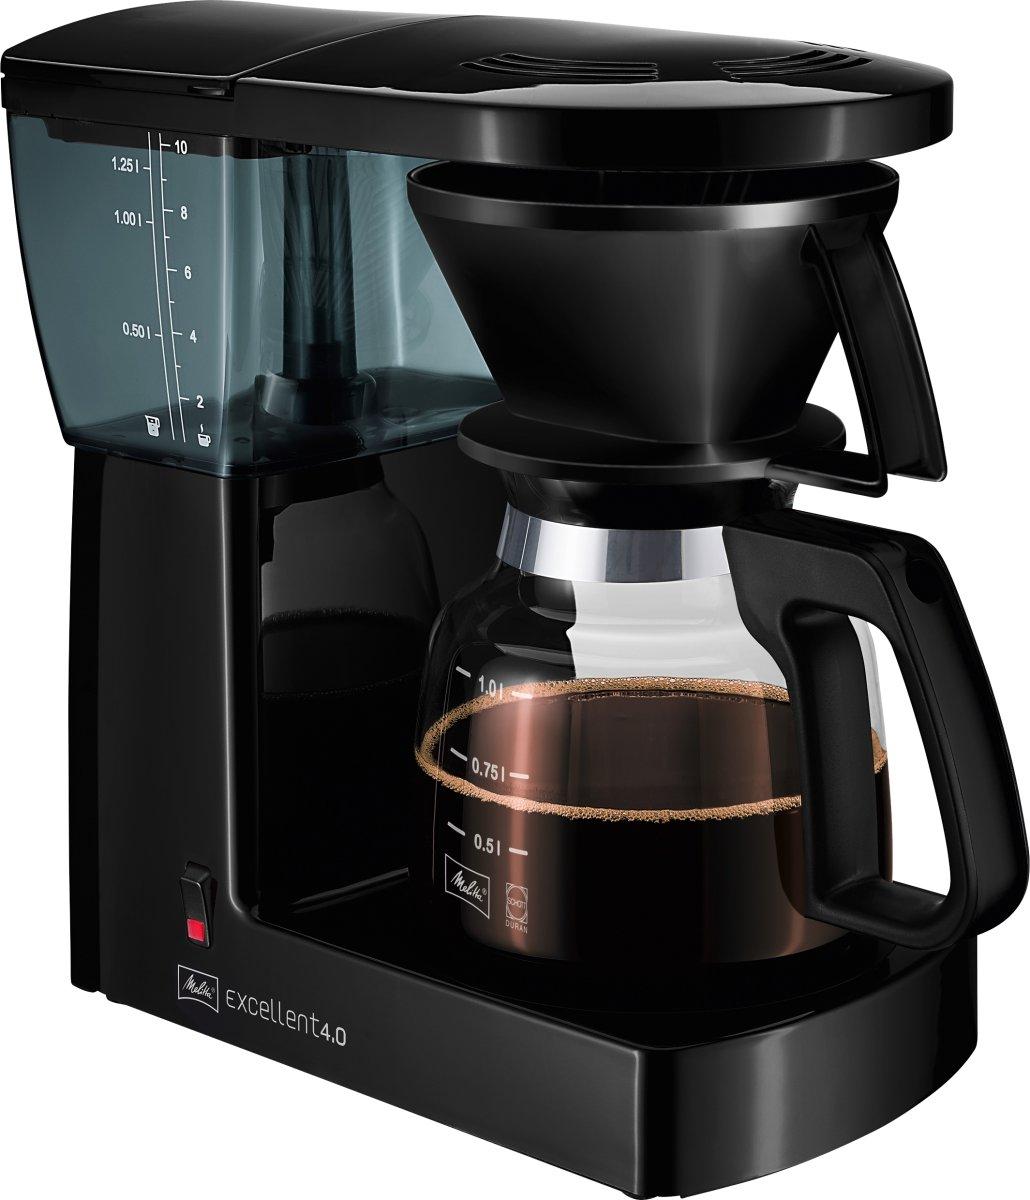 Melitta Excellent 4.0 kaffemaskine, sort